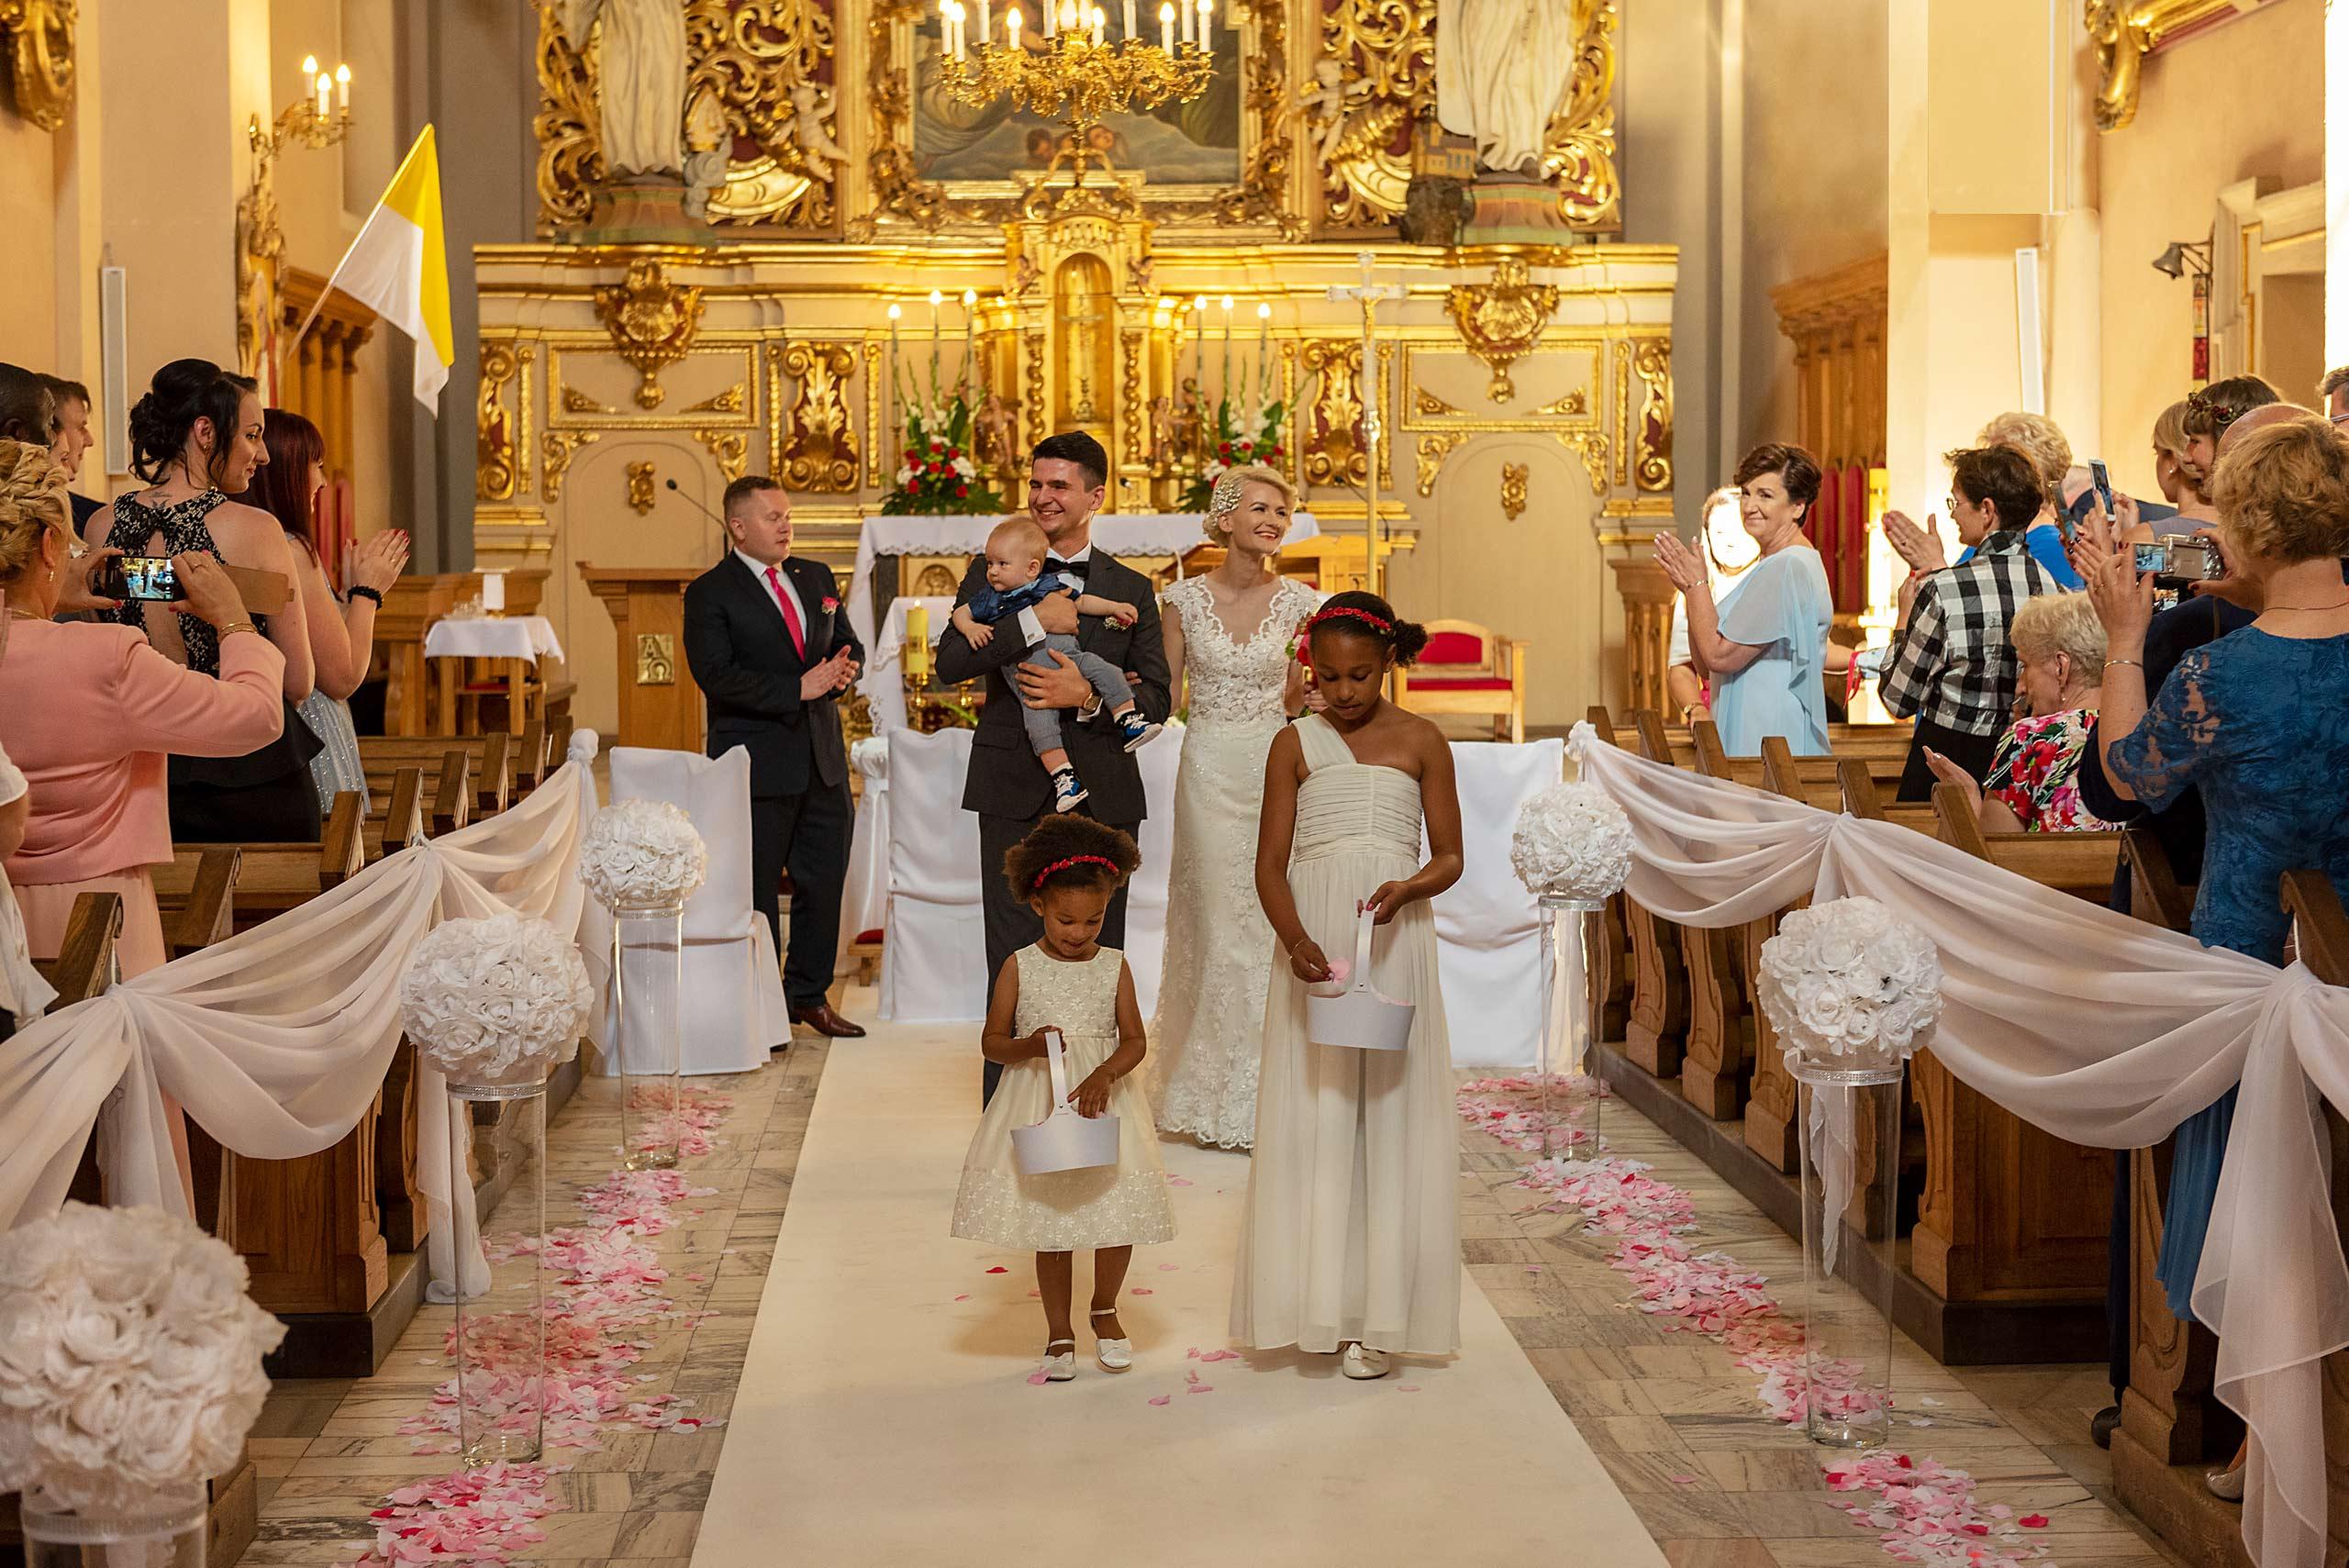 kirchliche Trauung, FotoEdmundo